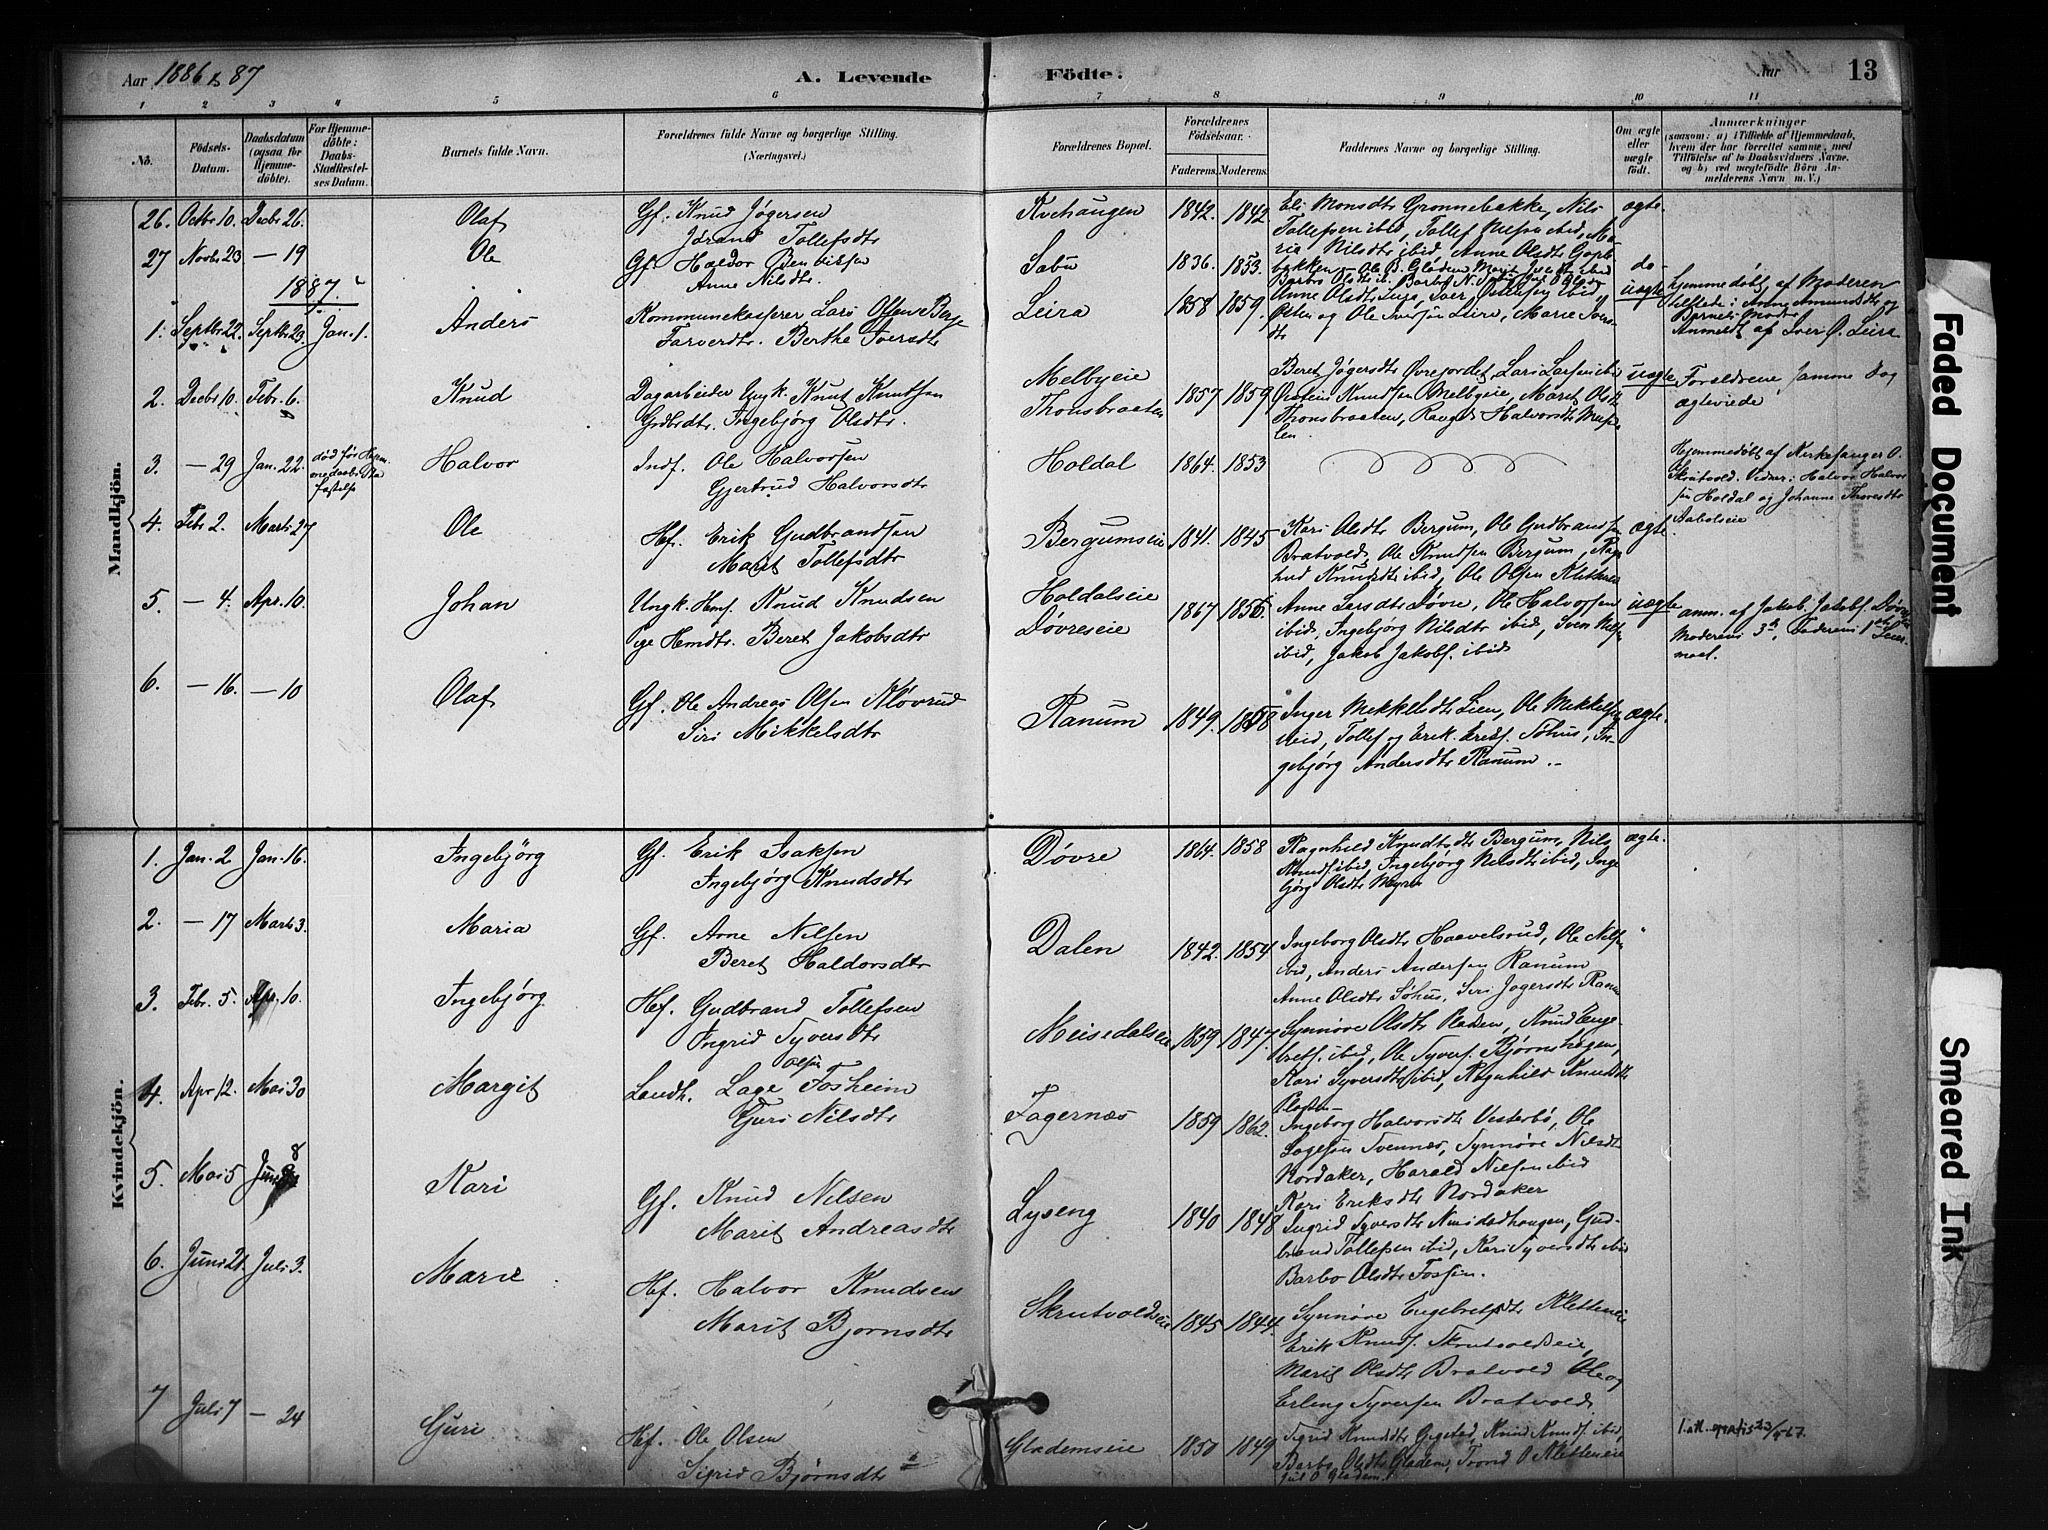 SAH, Nord-Aurdal prestekontor, Ministerialbok nr. 12, 1883-1895, s. 13